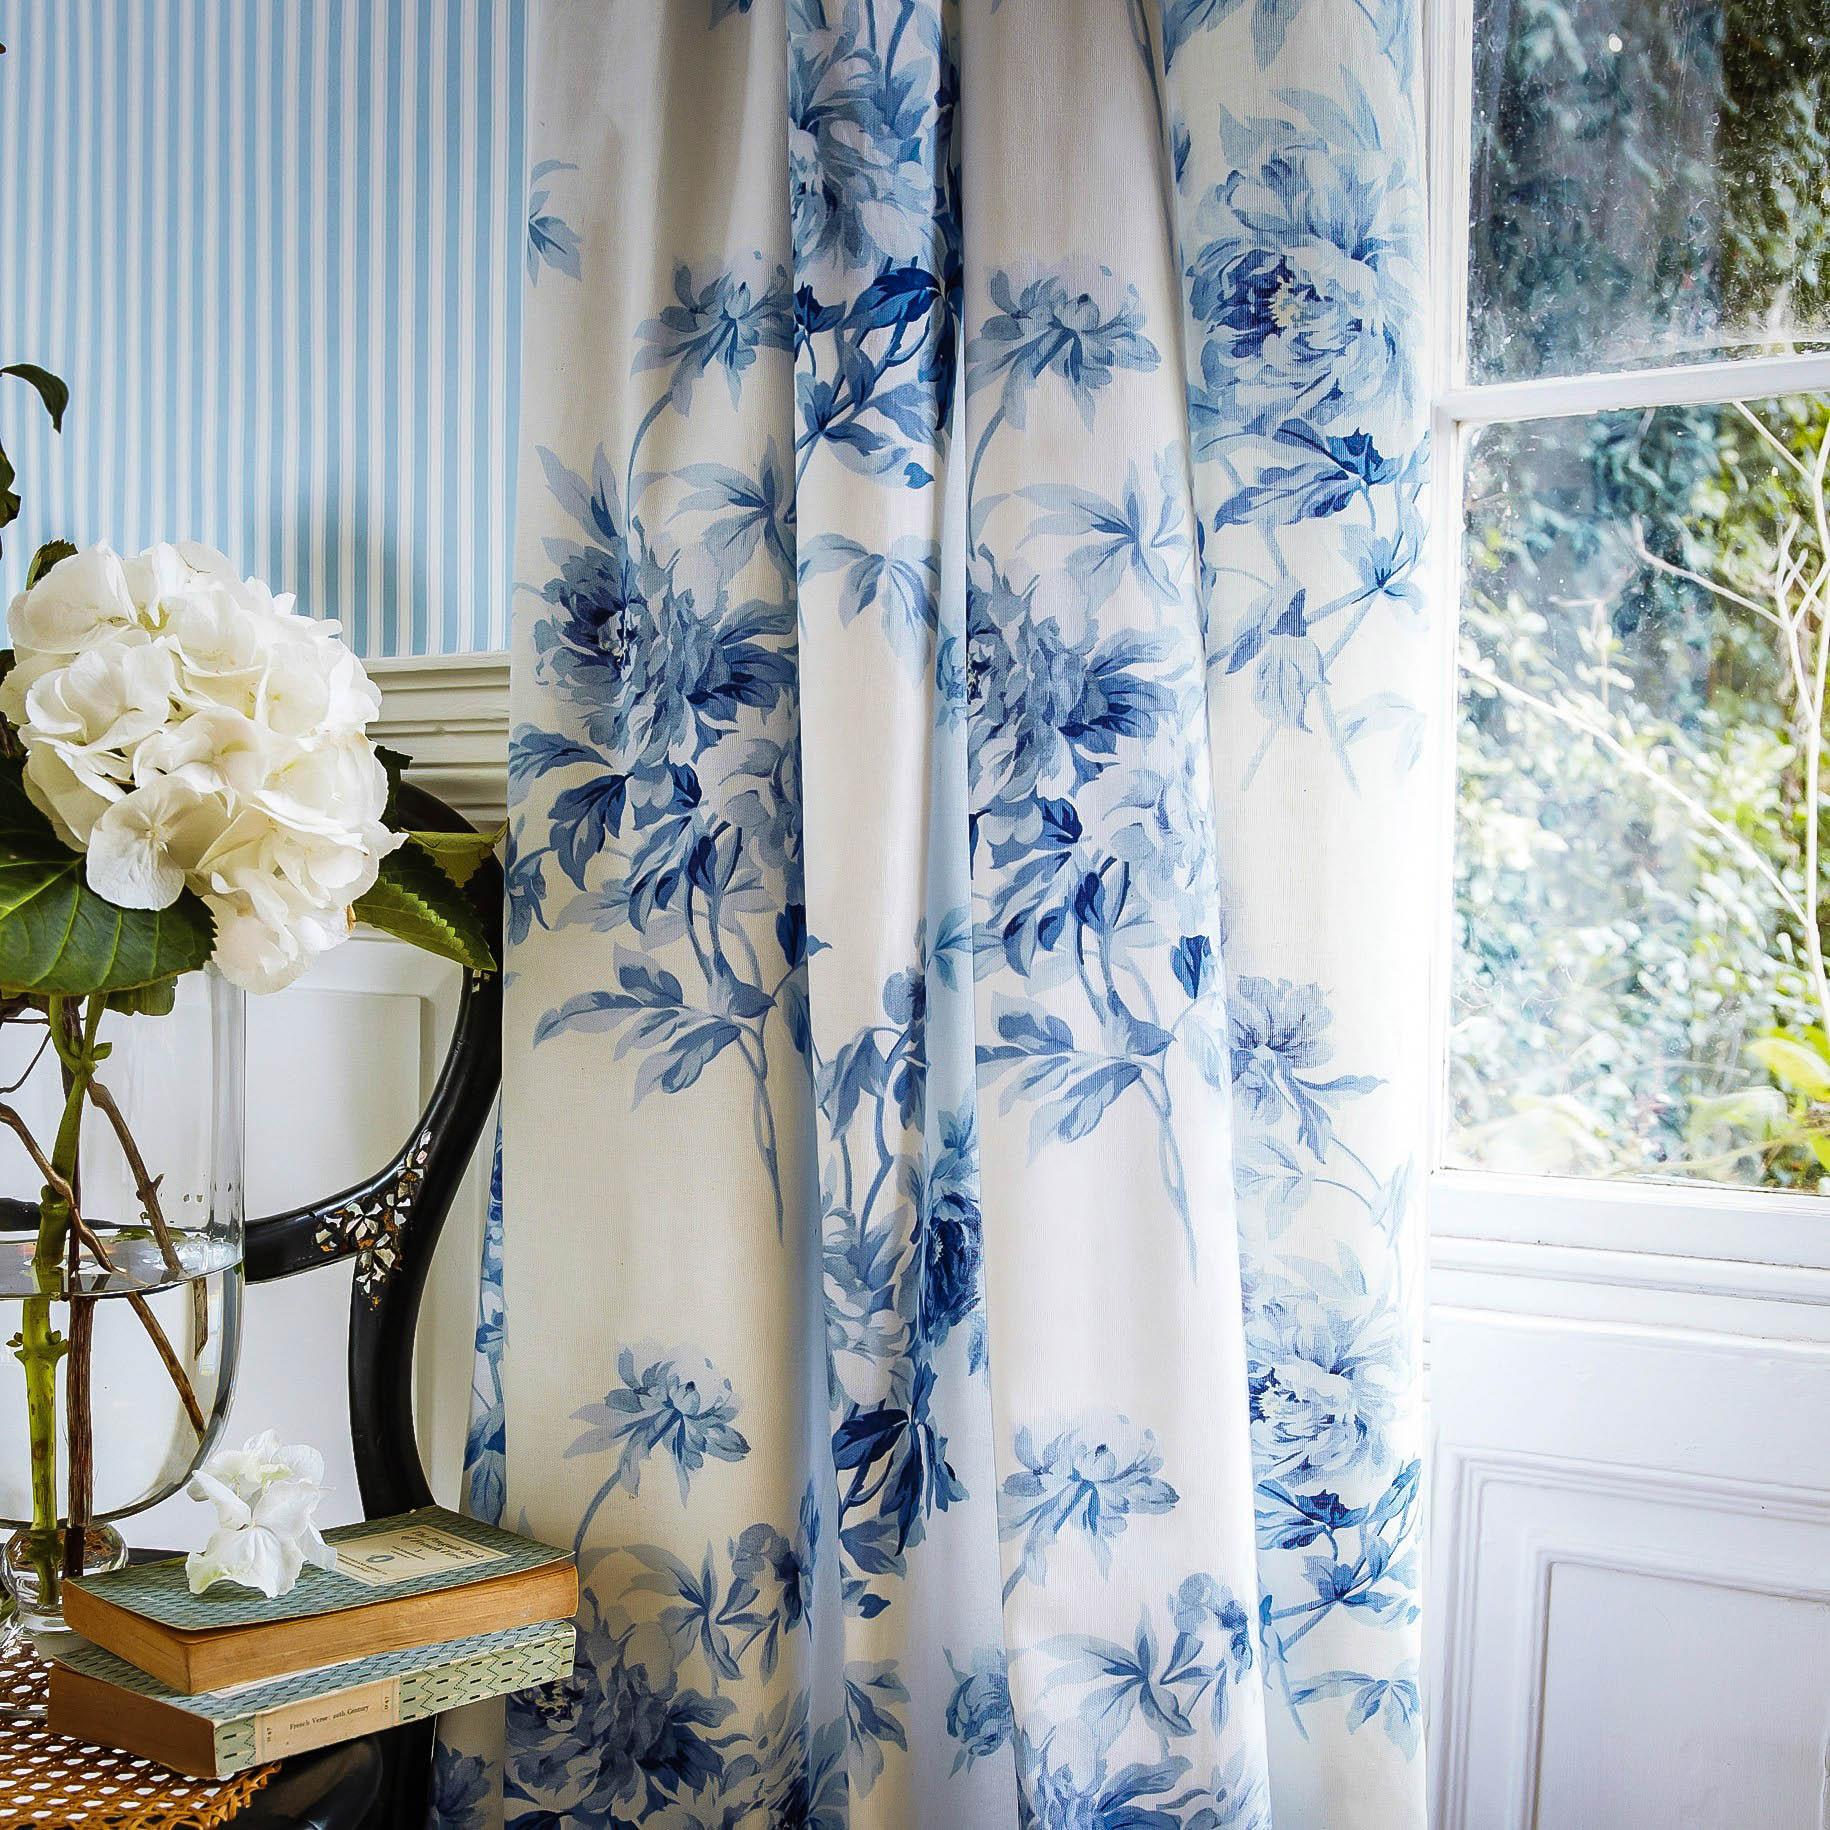 Lavish Floral Silk Drapes add Elegance to the Interior Decor of Luxury Homes